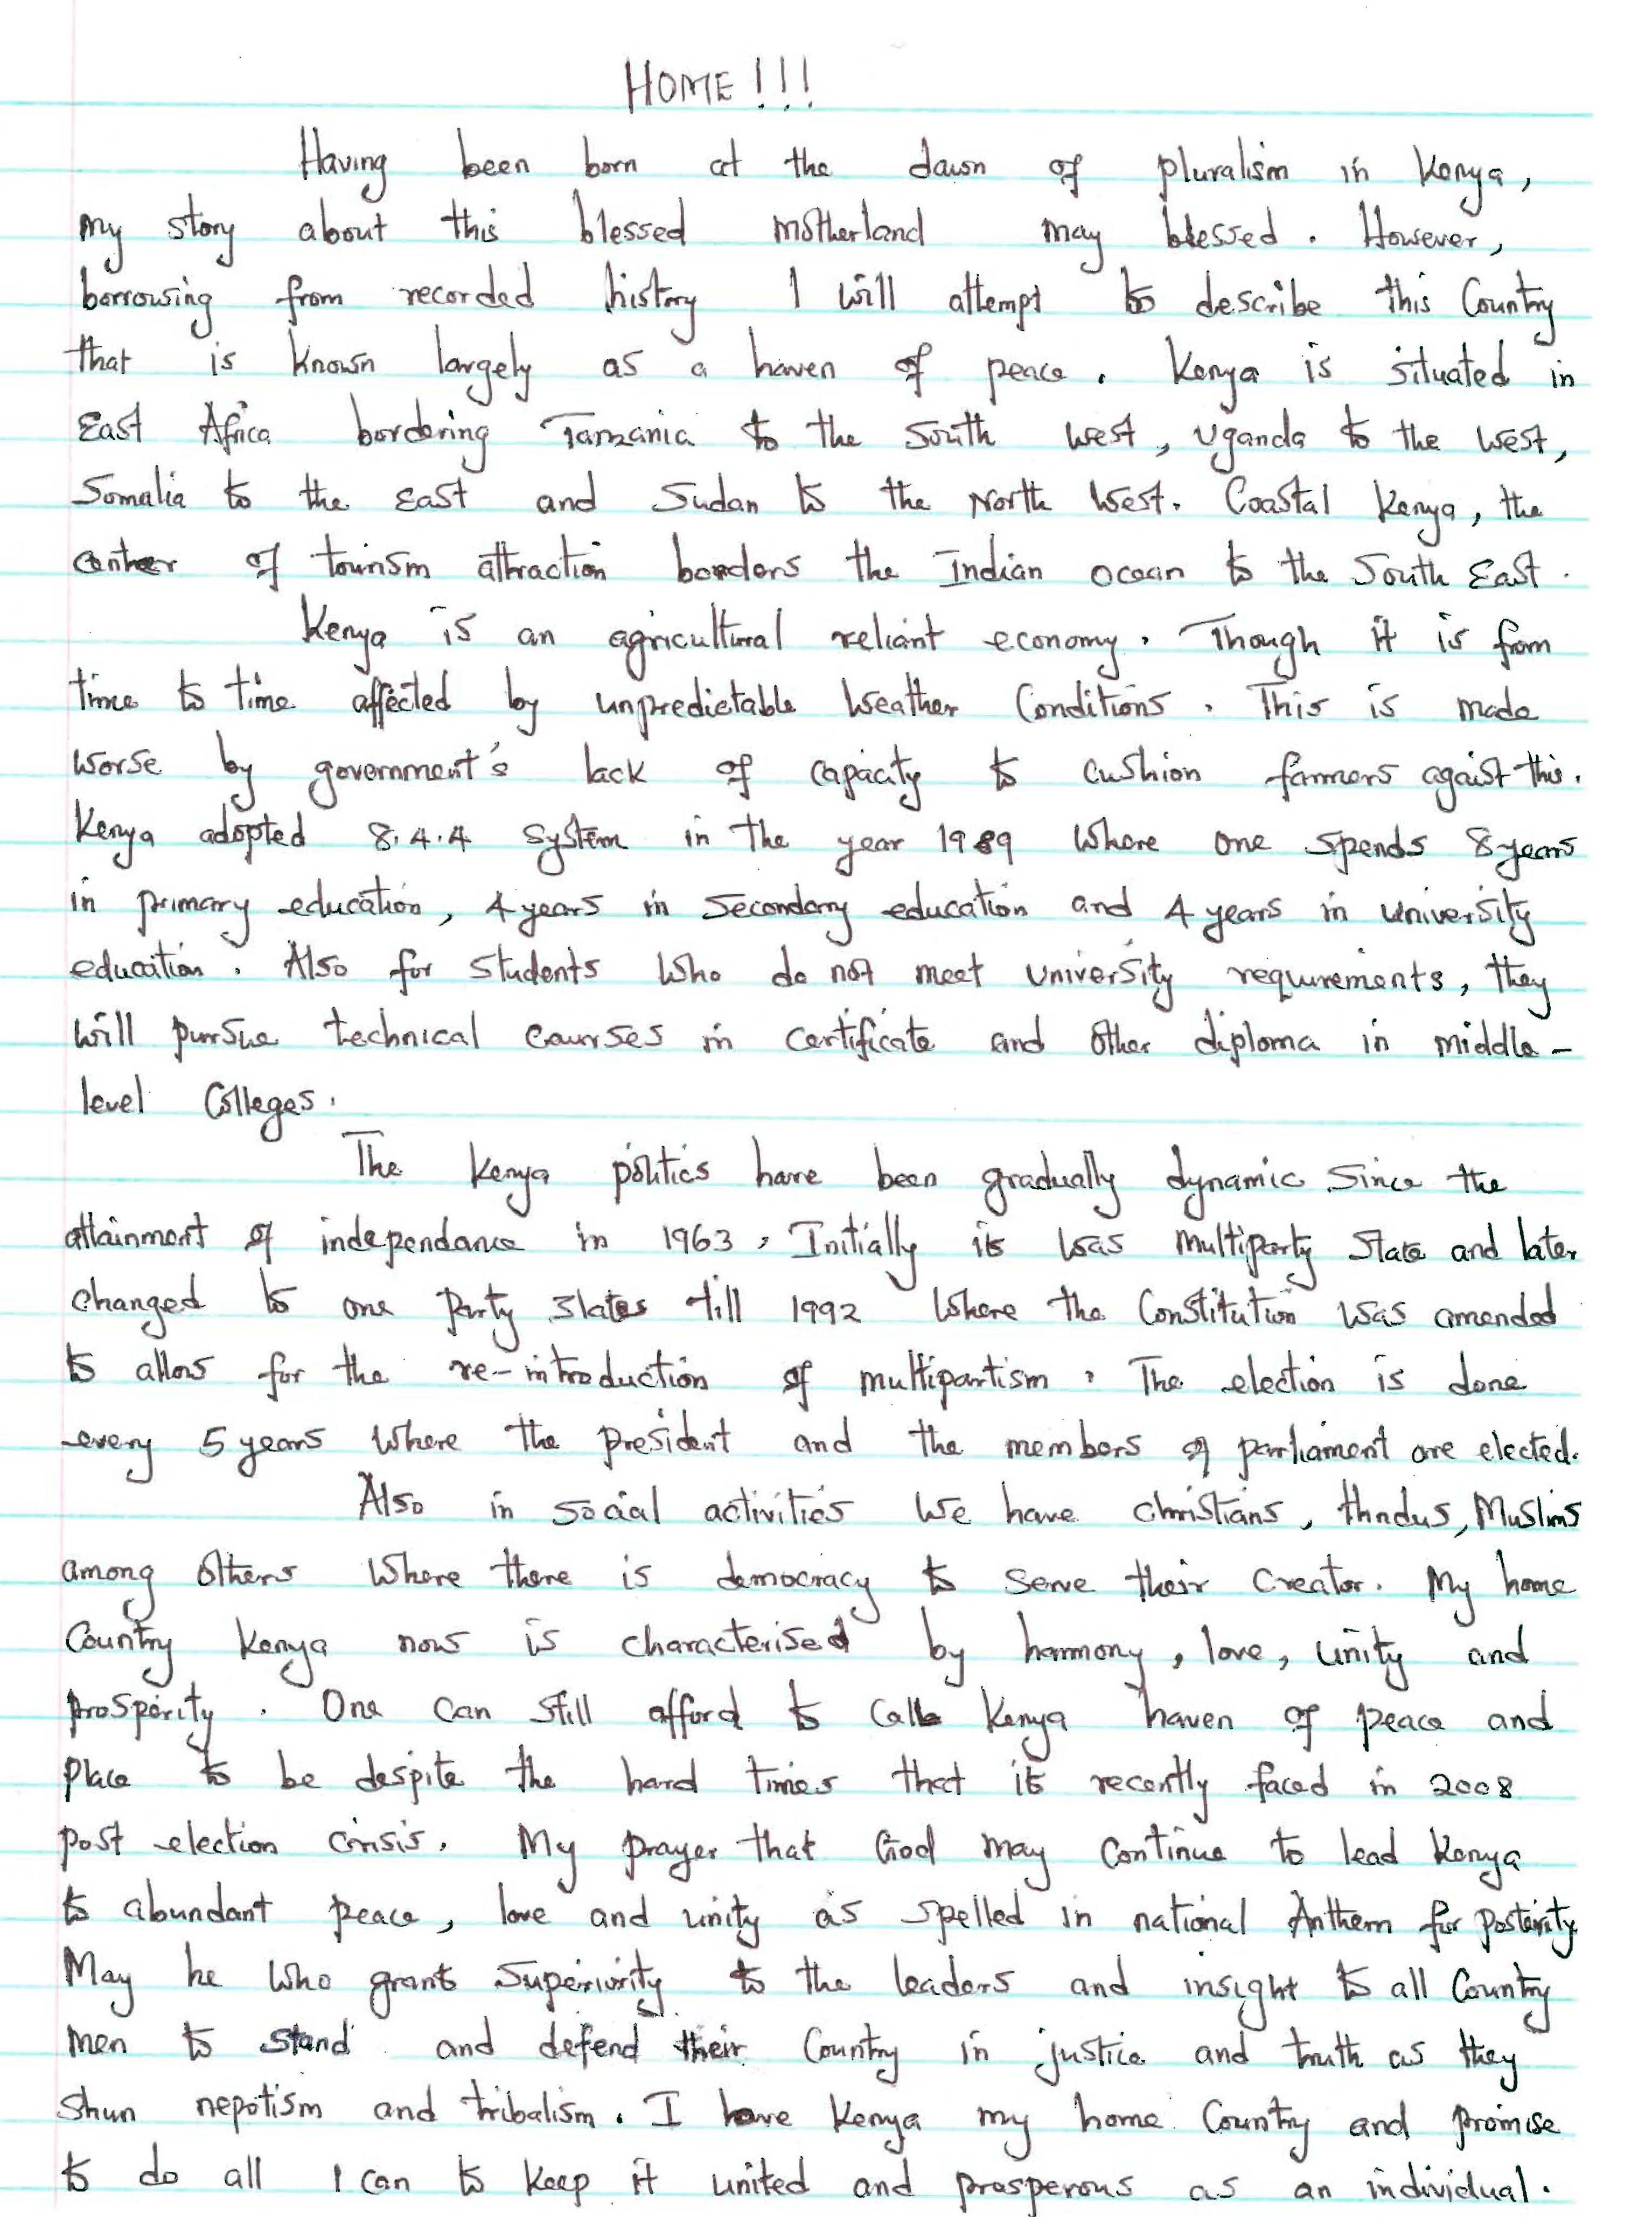 005 My Dream House Descriptive Essay Description Sweet Home Wr Writing Beautiful Ideal Town Full